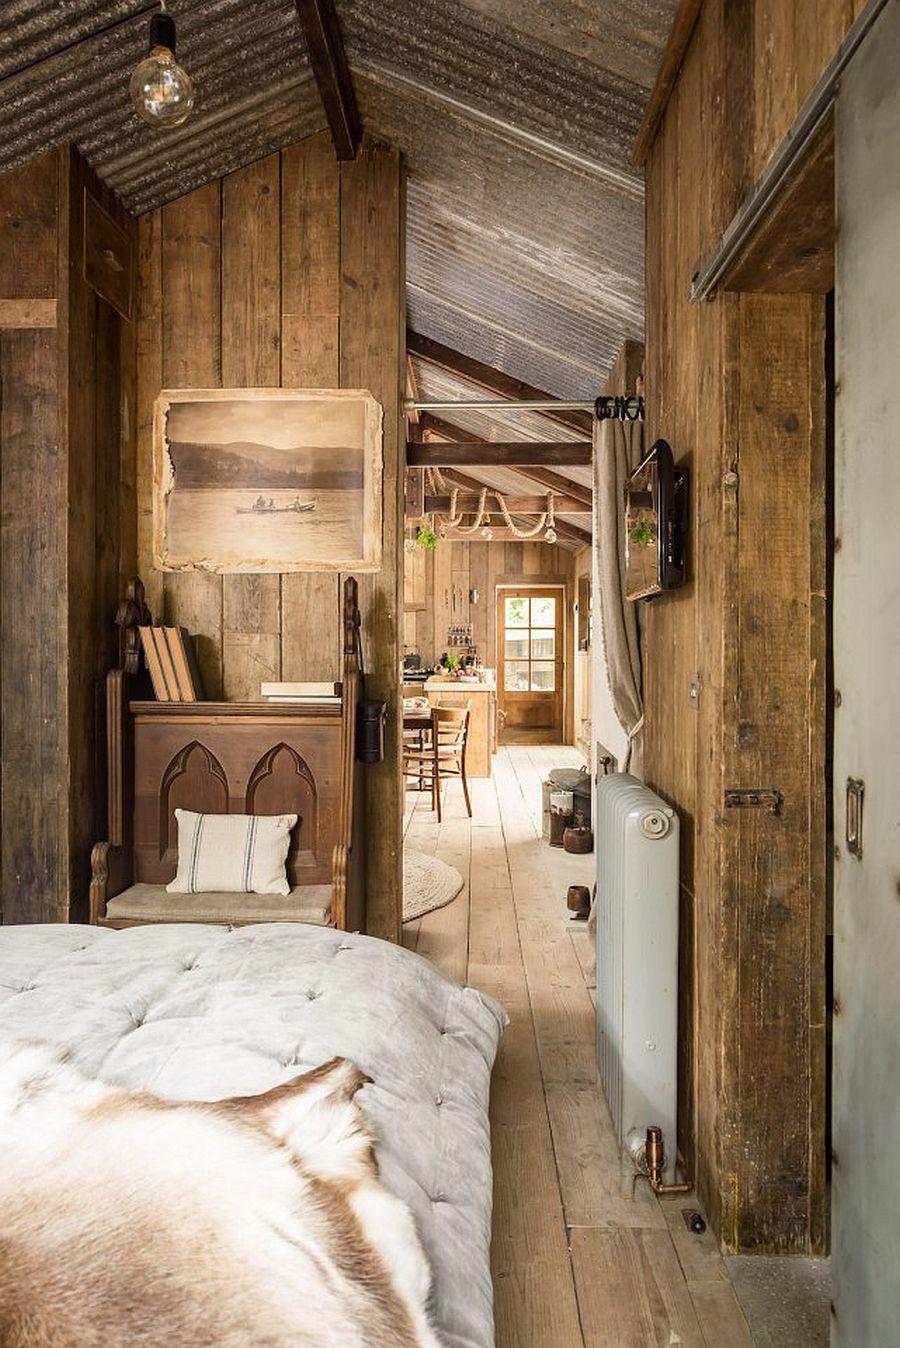 adelaparvu.com despre cabana rustica si tuse industriale, Firefly Cabin, Cornwall, Anglia, Foto Unique Home Stays (7)